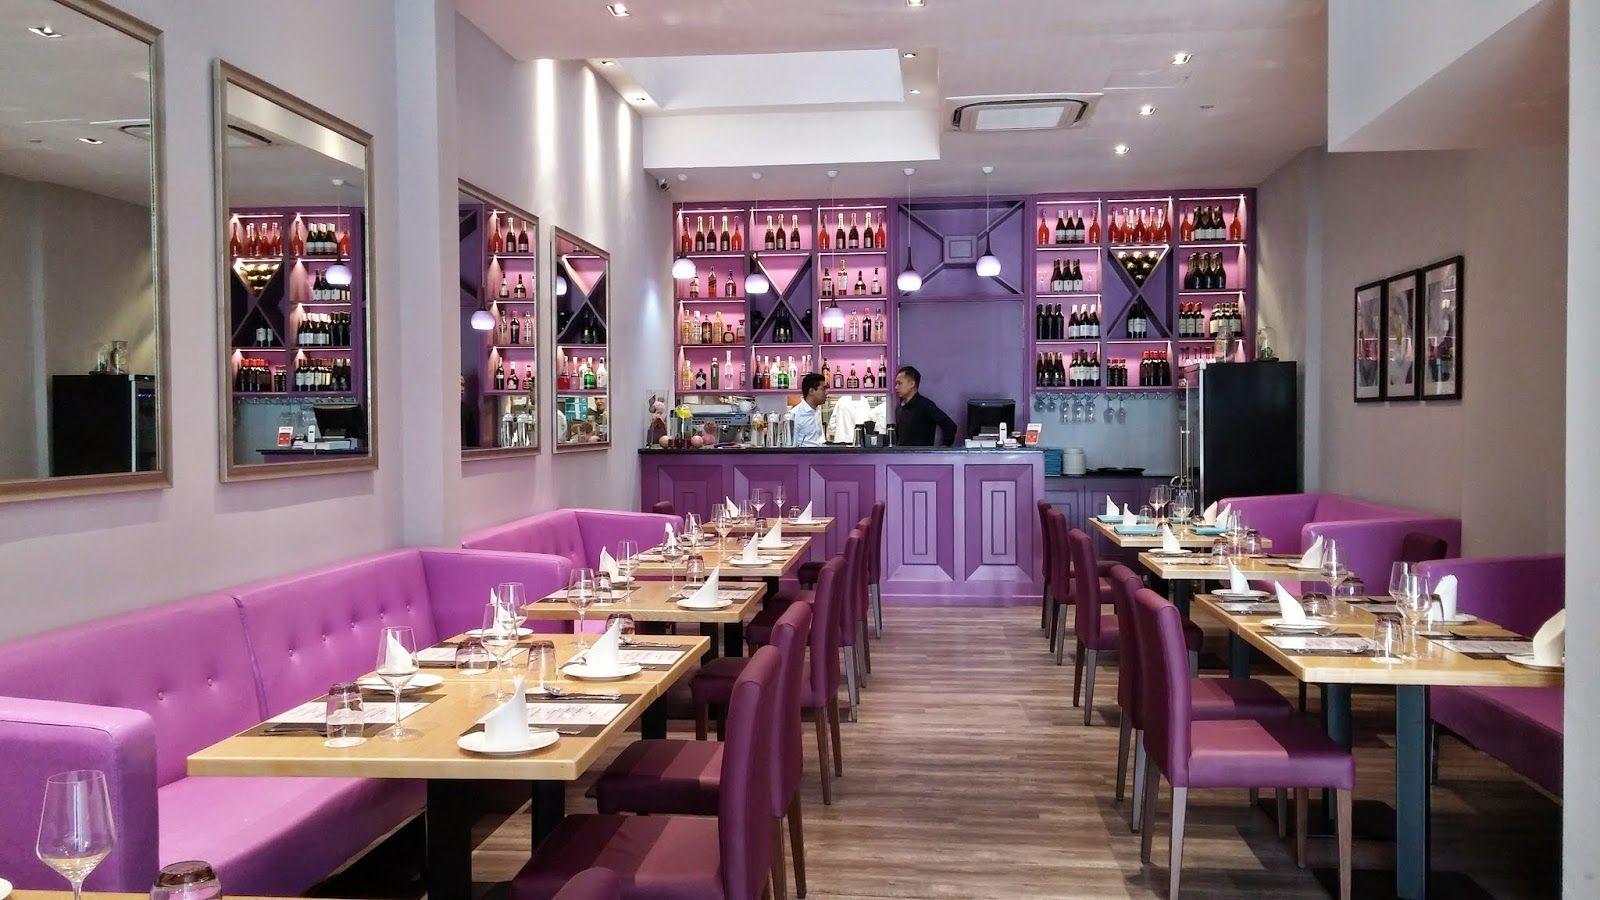 singapore food blog restaurant week lunch at violet herbs 81 tras street singapore 079020 reservation 6221 3988